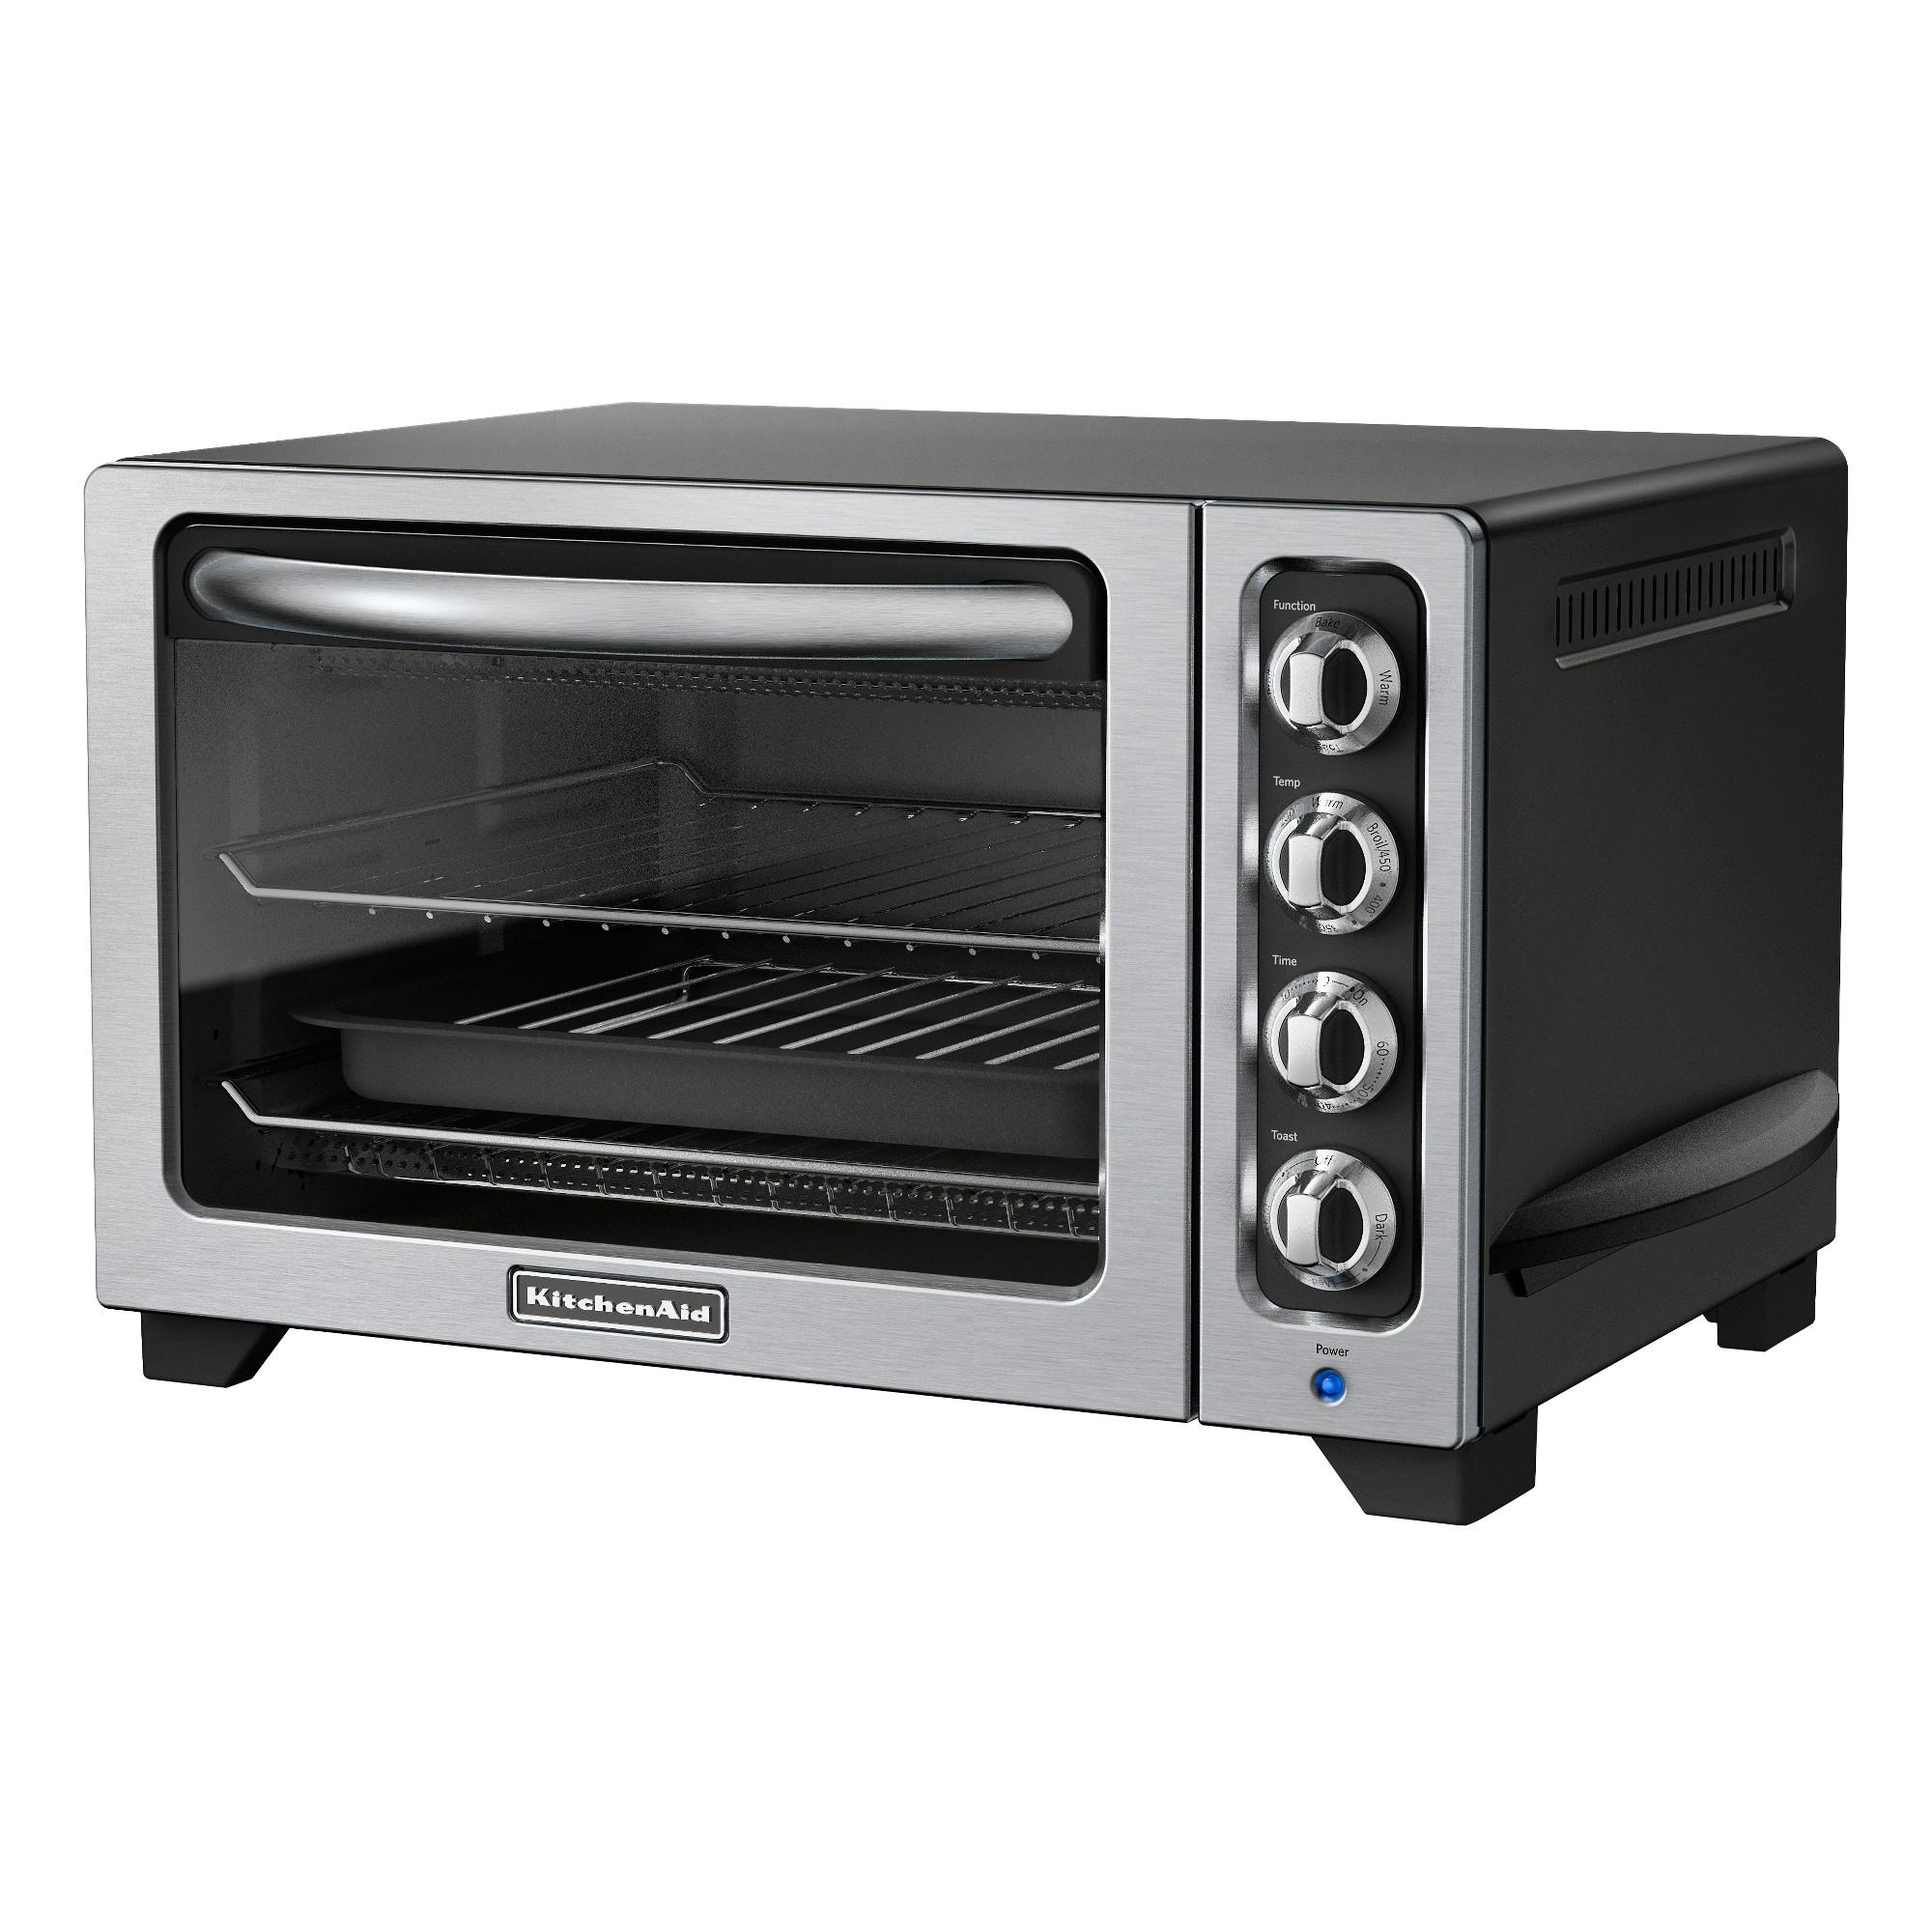 Kitchenaid 12 Quot Countertop Oven Kco222 Countertop